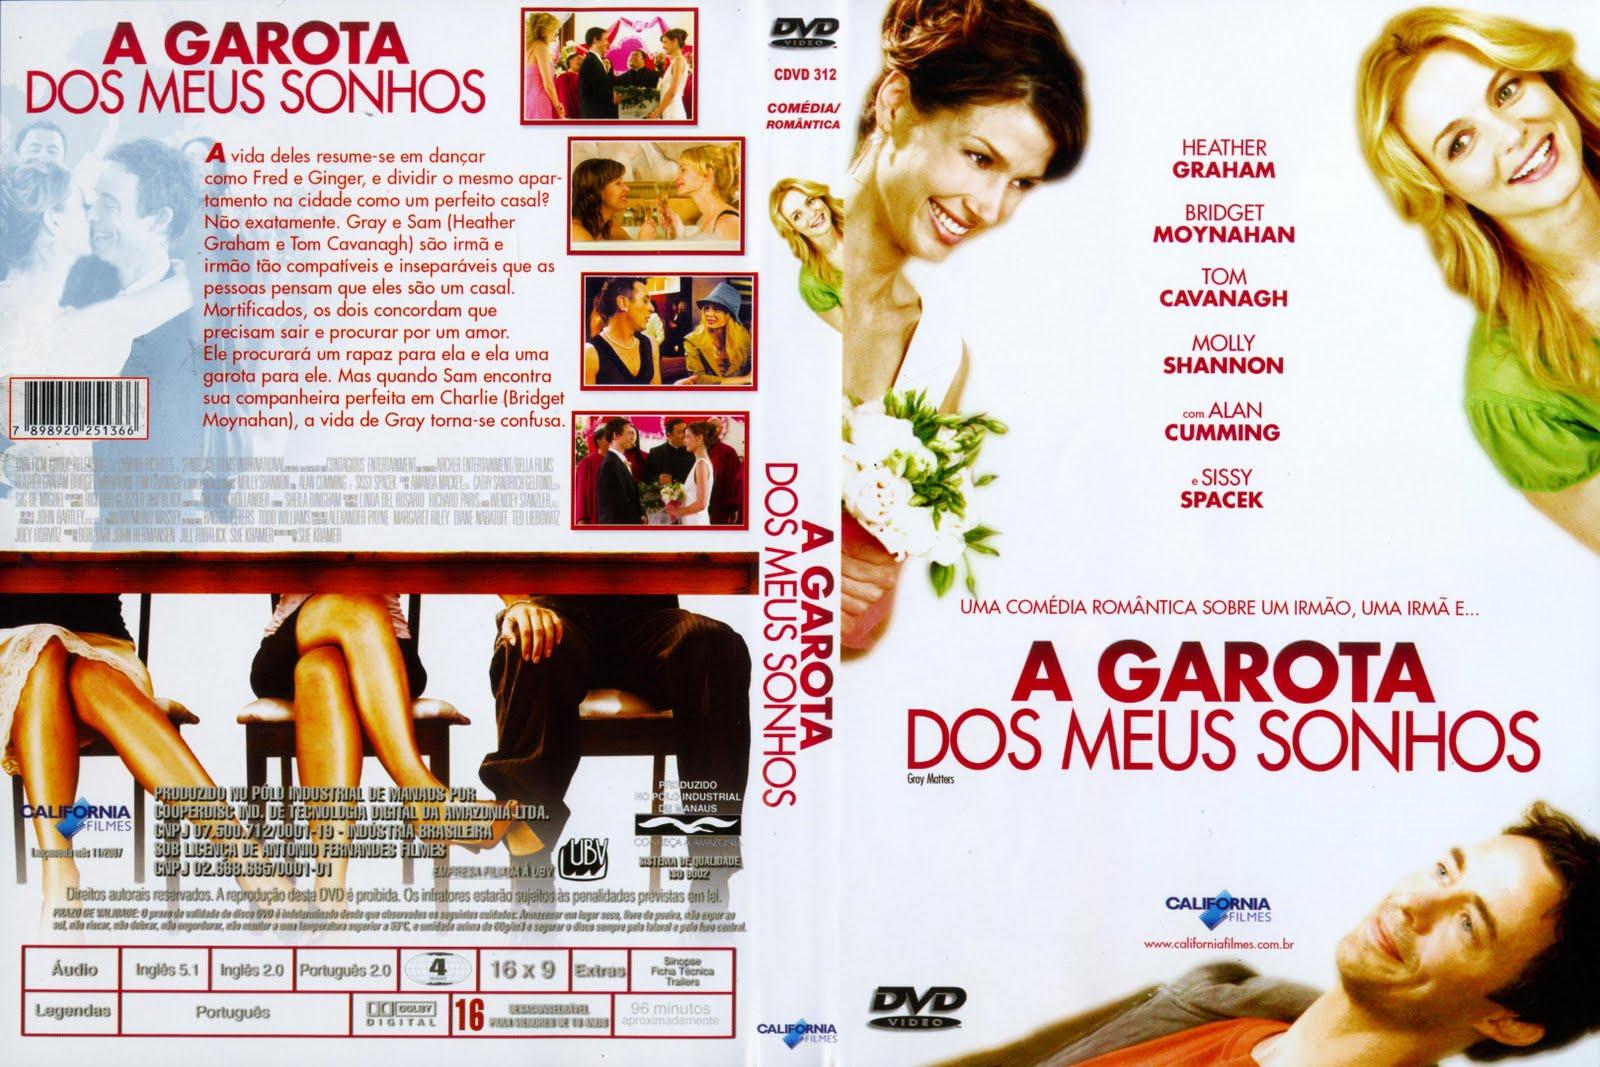 http://3.bp.blogspot.com/_avx0CDv74_c/TCo81CE6jYI/AAAAAAAAABs/uz_E7nagxP4/s1600/A-Garota-Dos-Meus-Sonhos2.jpg